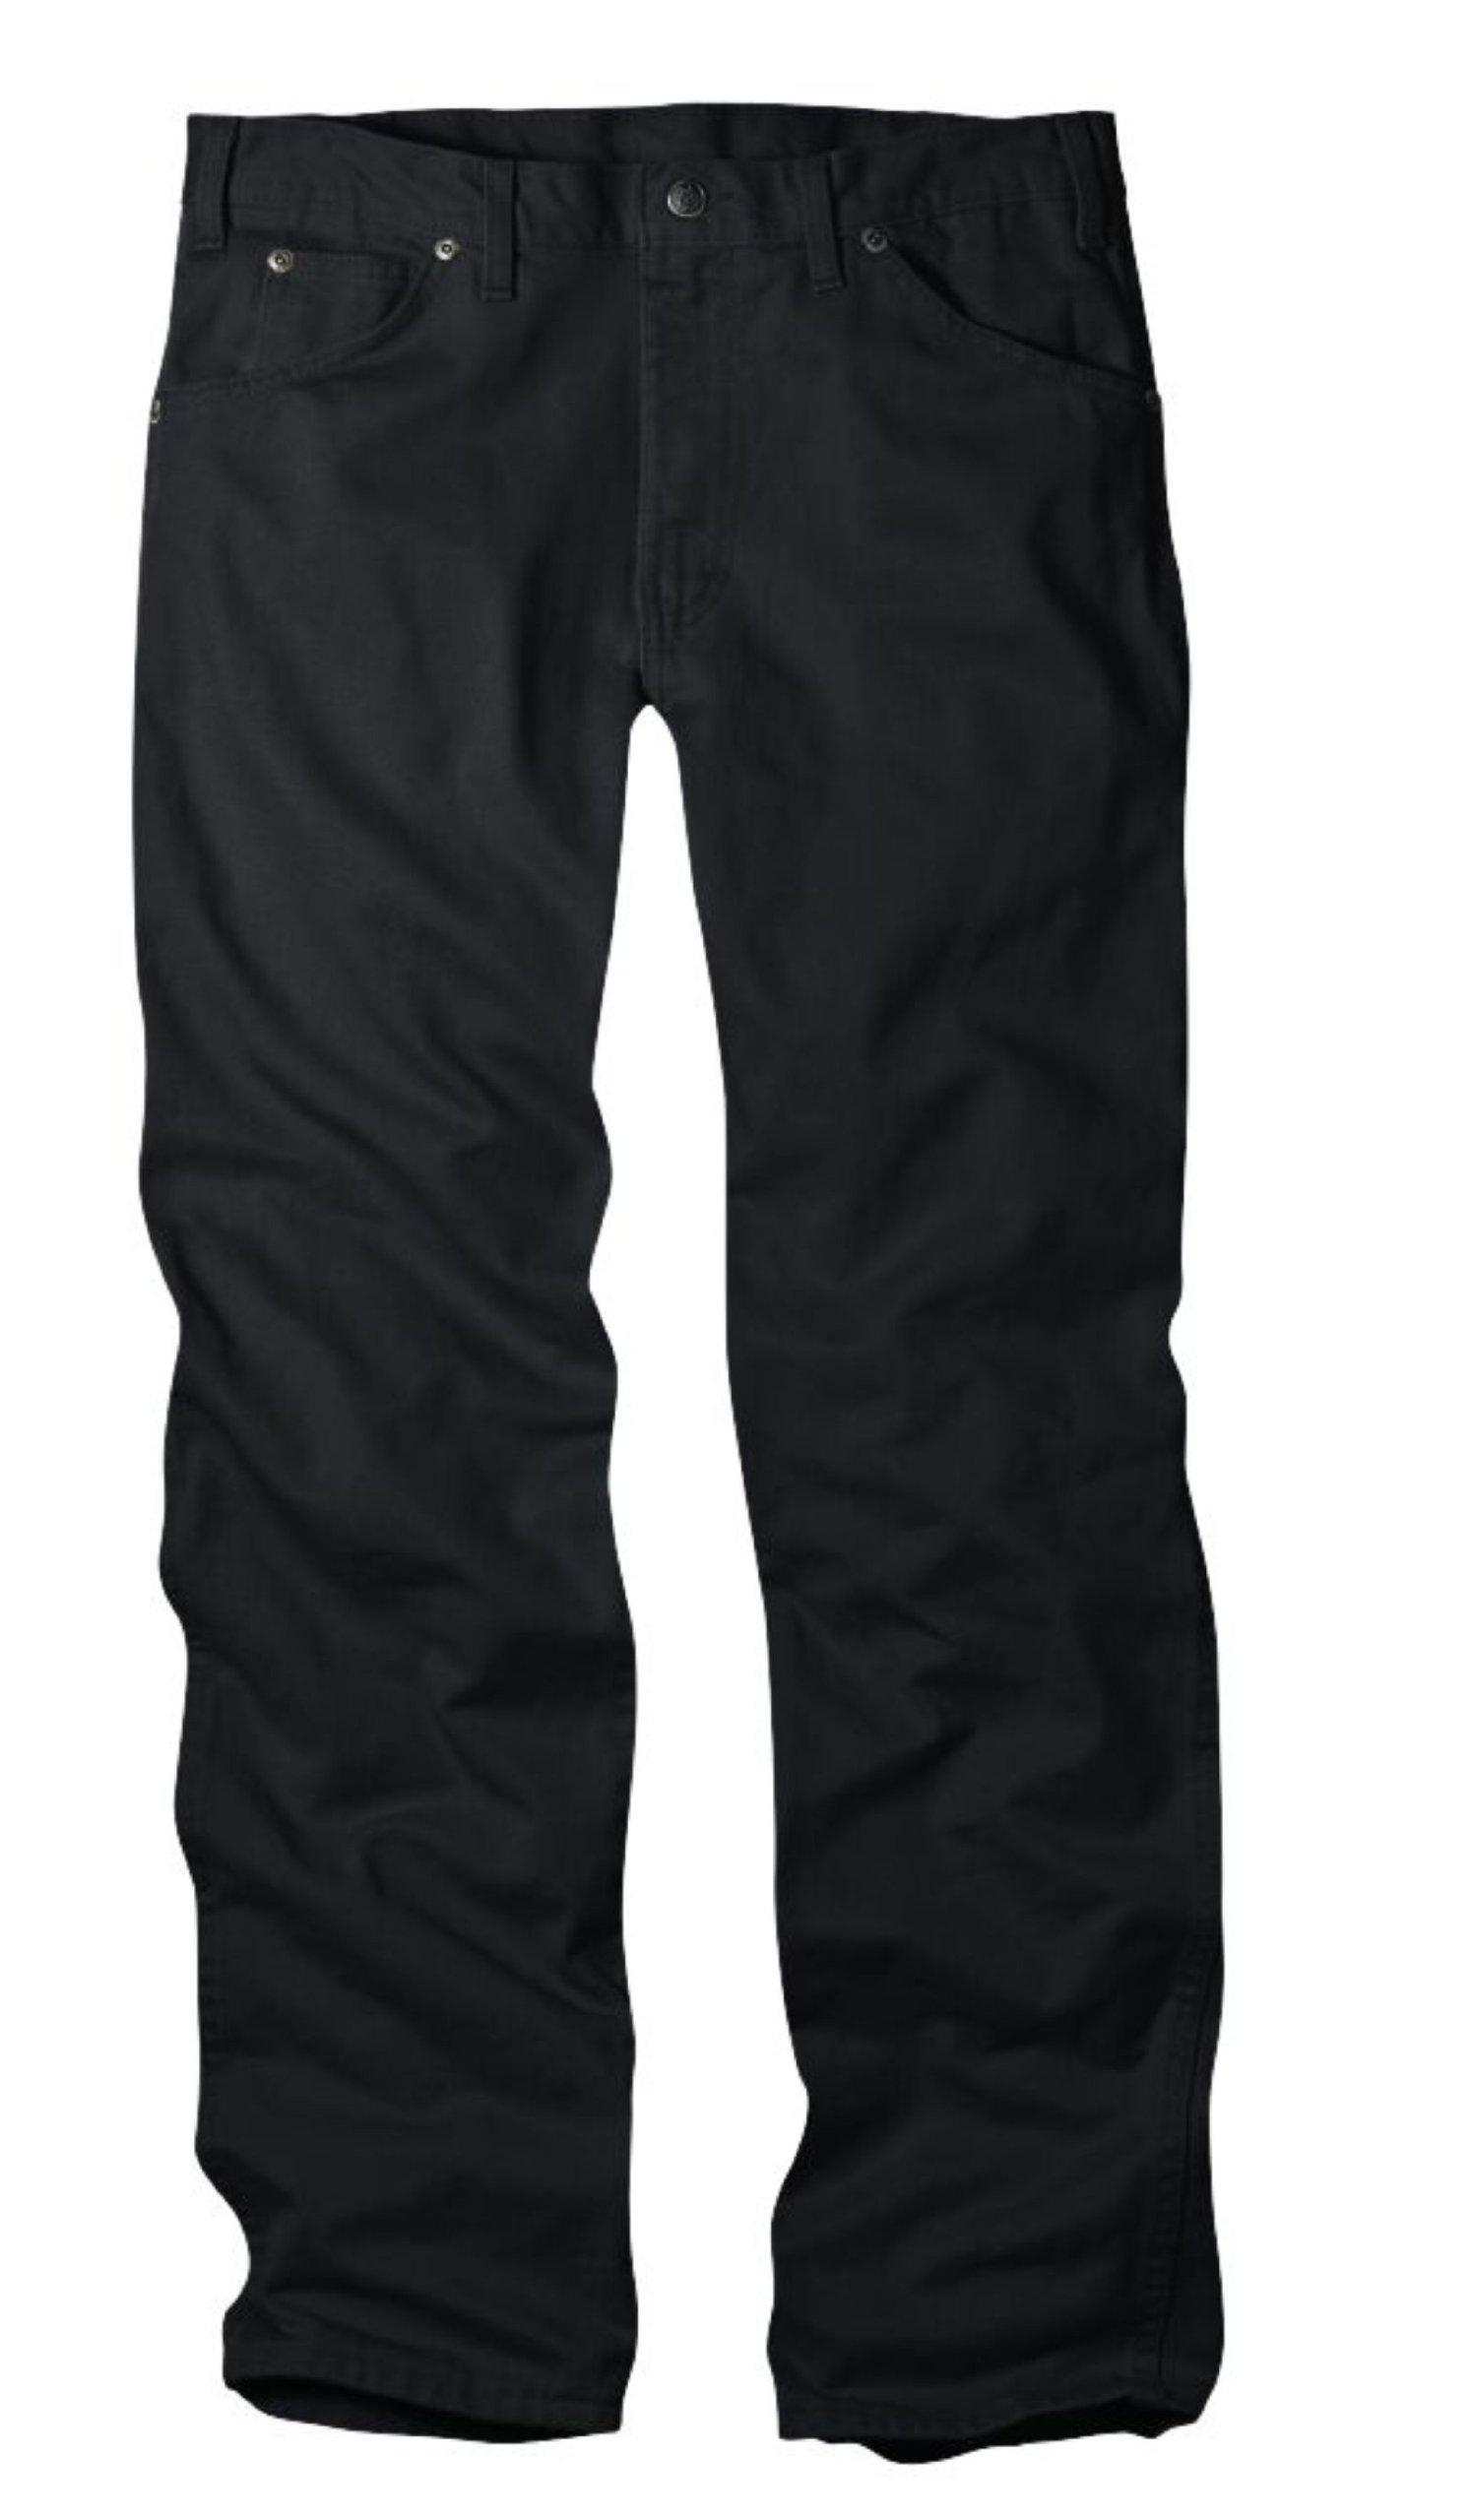 Dickies Men's Regular Fit 5-Pocket Prewashed Jean, Overdyed Black, 33x30